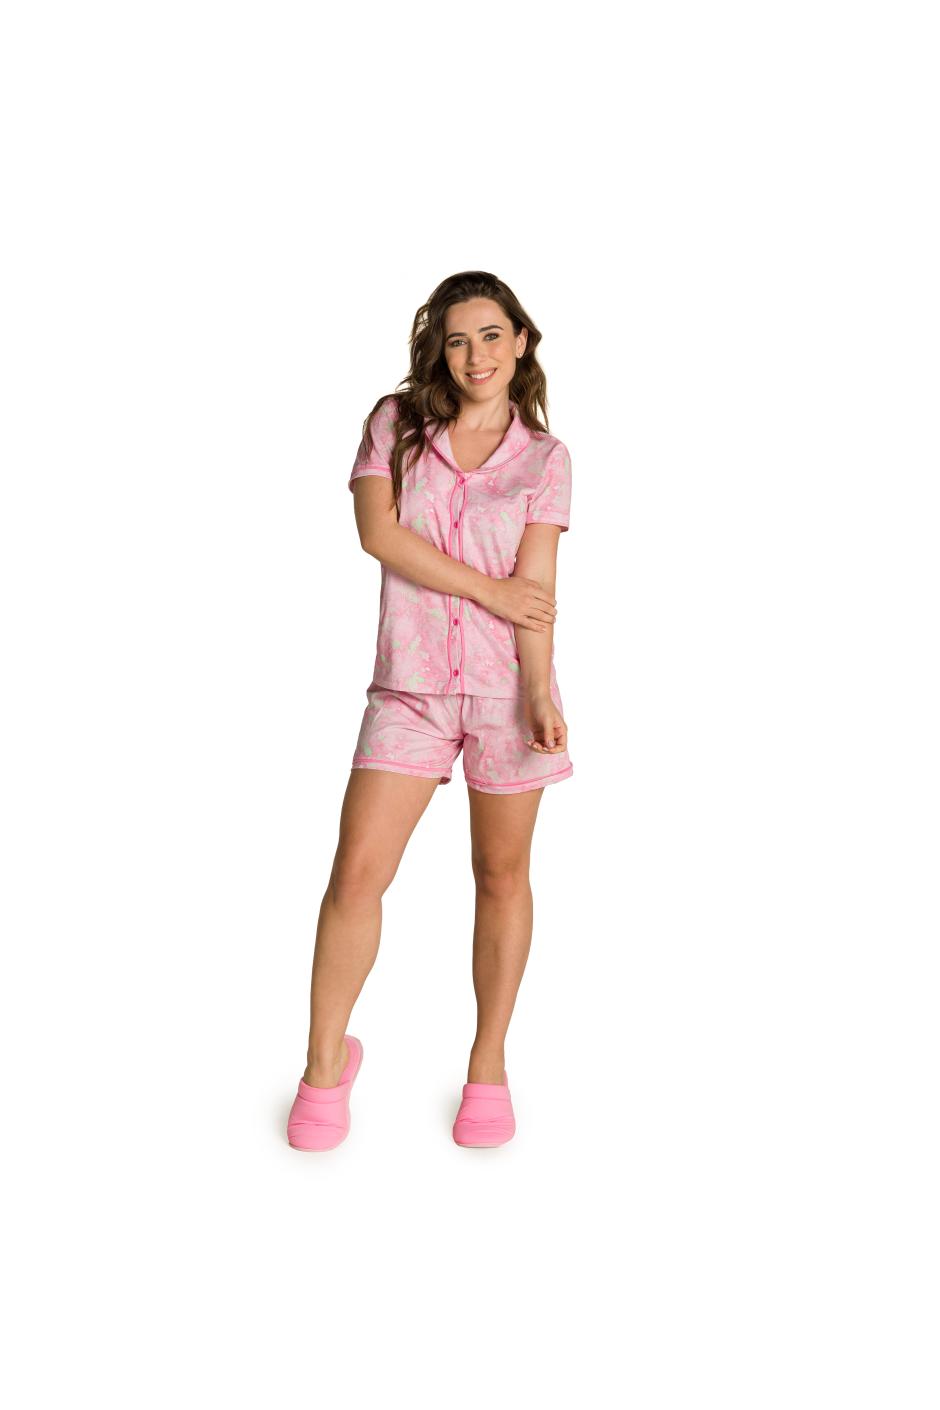 006/C - Pijama Feminino Adulto Tie Dye com Gola e Filetes